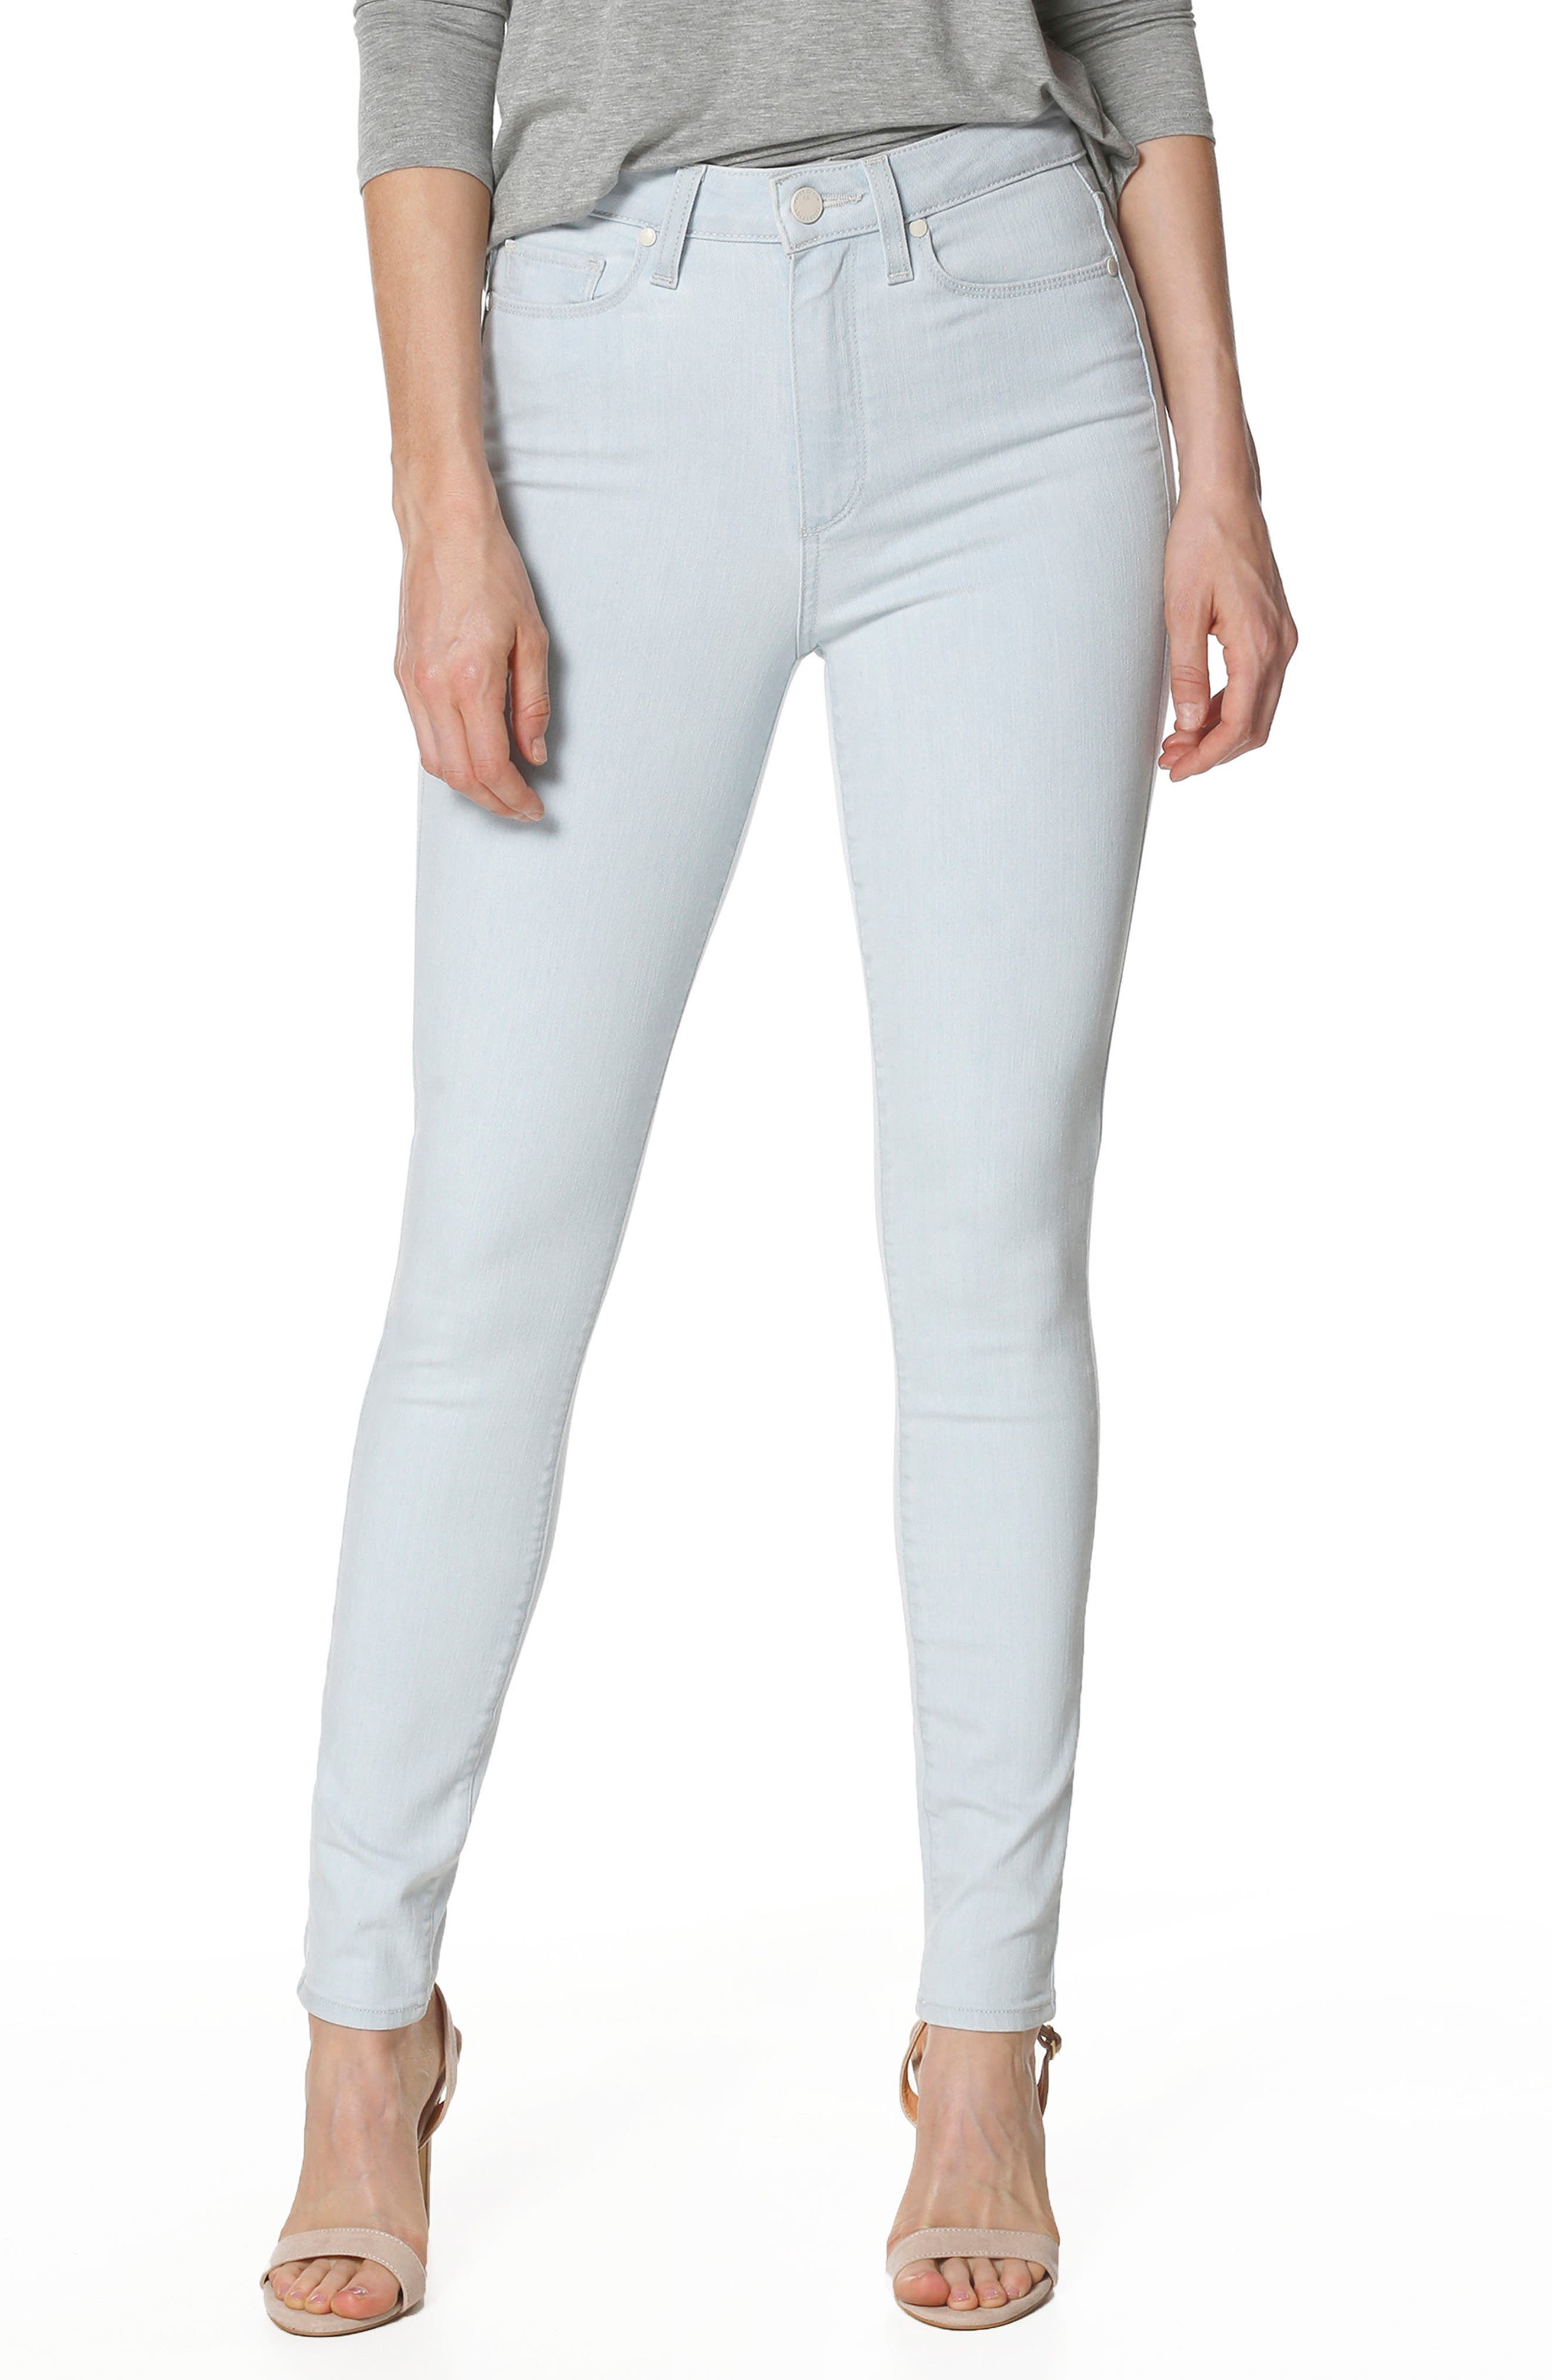 Margot High Waist Ultra Skinny Jeans,                         Main,                         color,